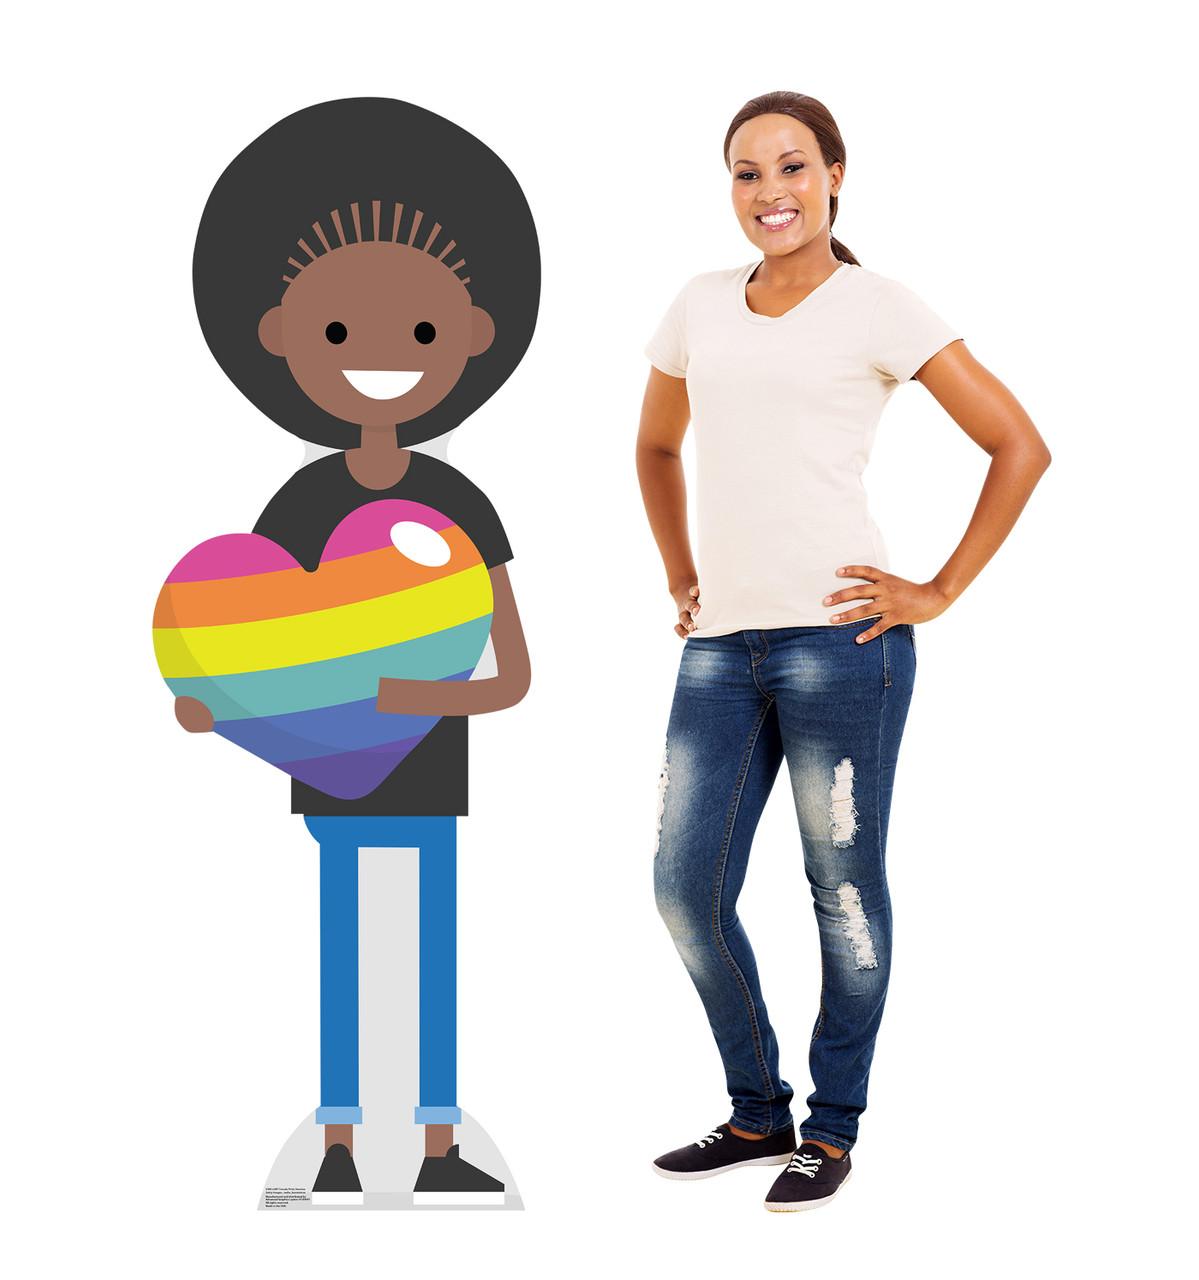 Life-size cardboard Female Cartoon Pride Standee with model.